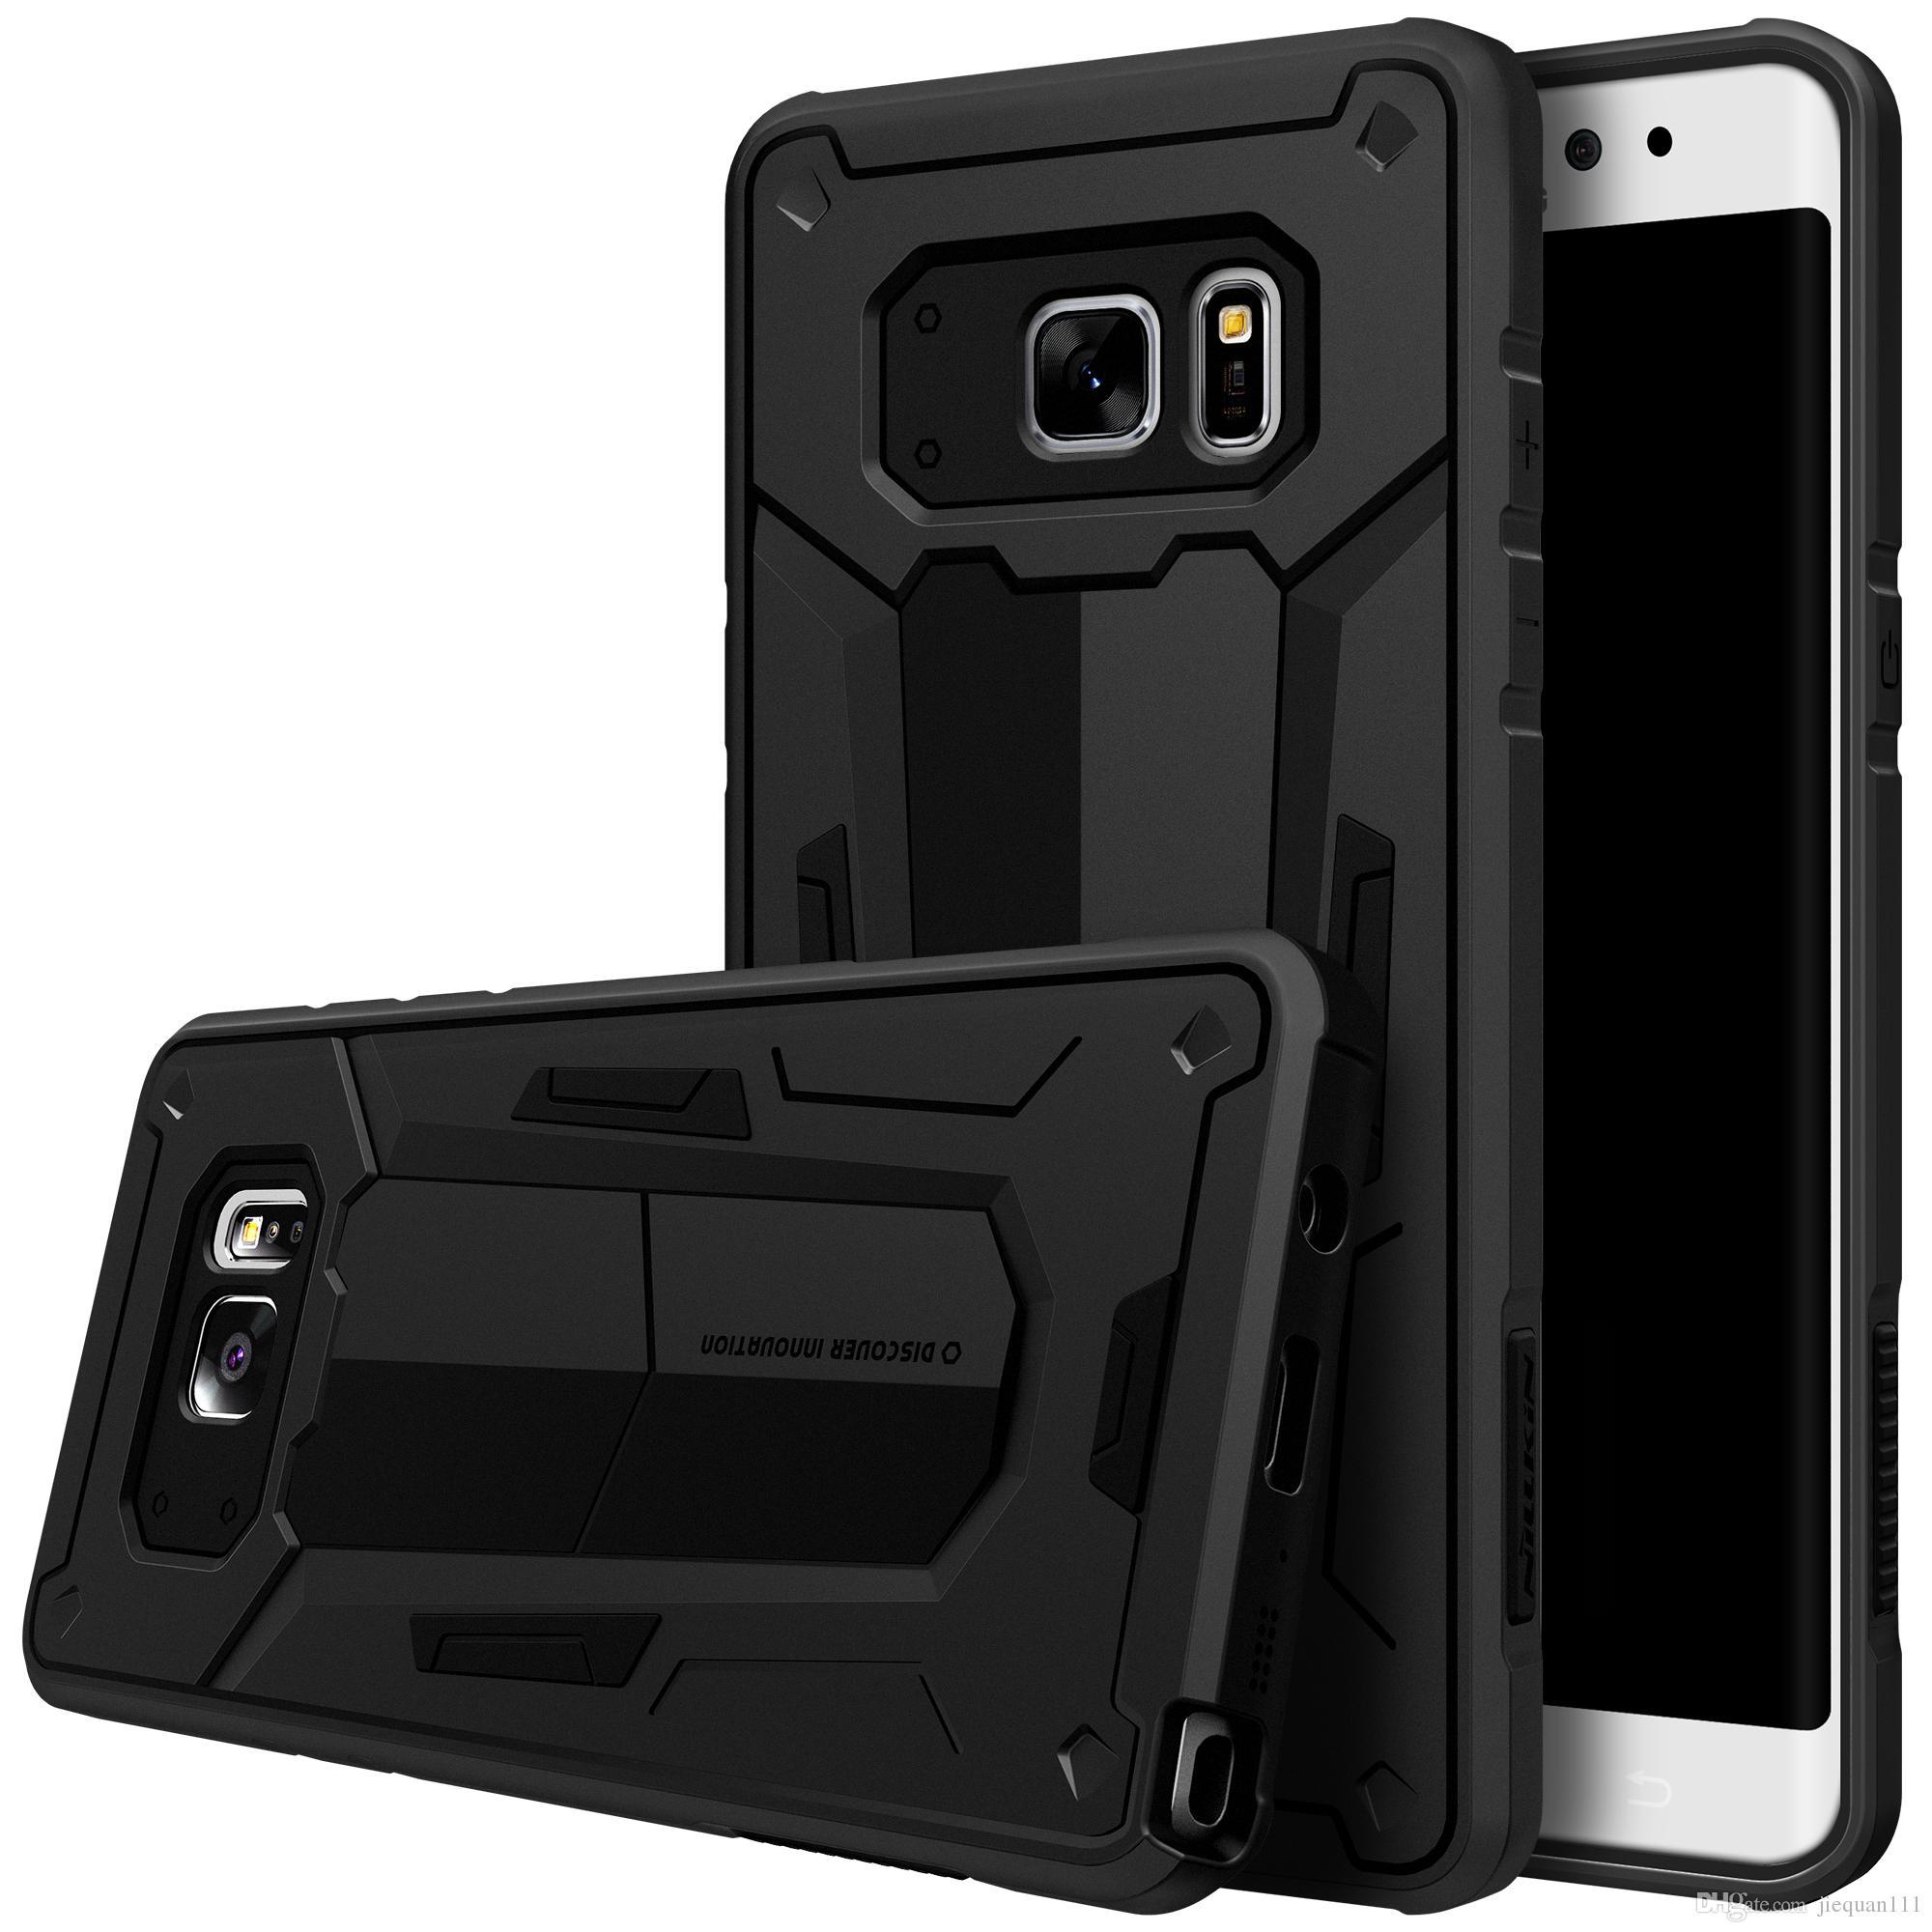 galaxy co resistant ultra electronics samsung slim case uk protection slip black phone rug design non tqtnl rugged dp amazon vrs